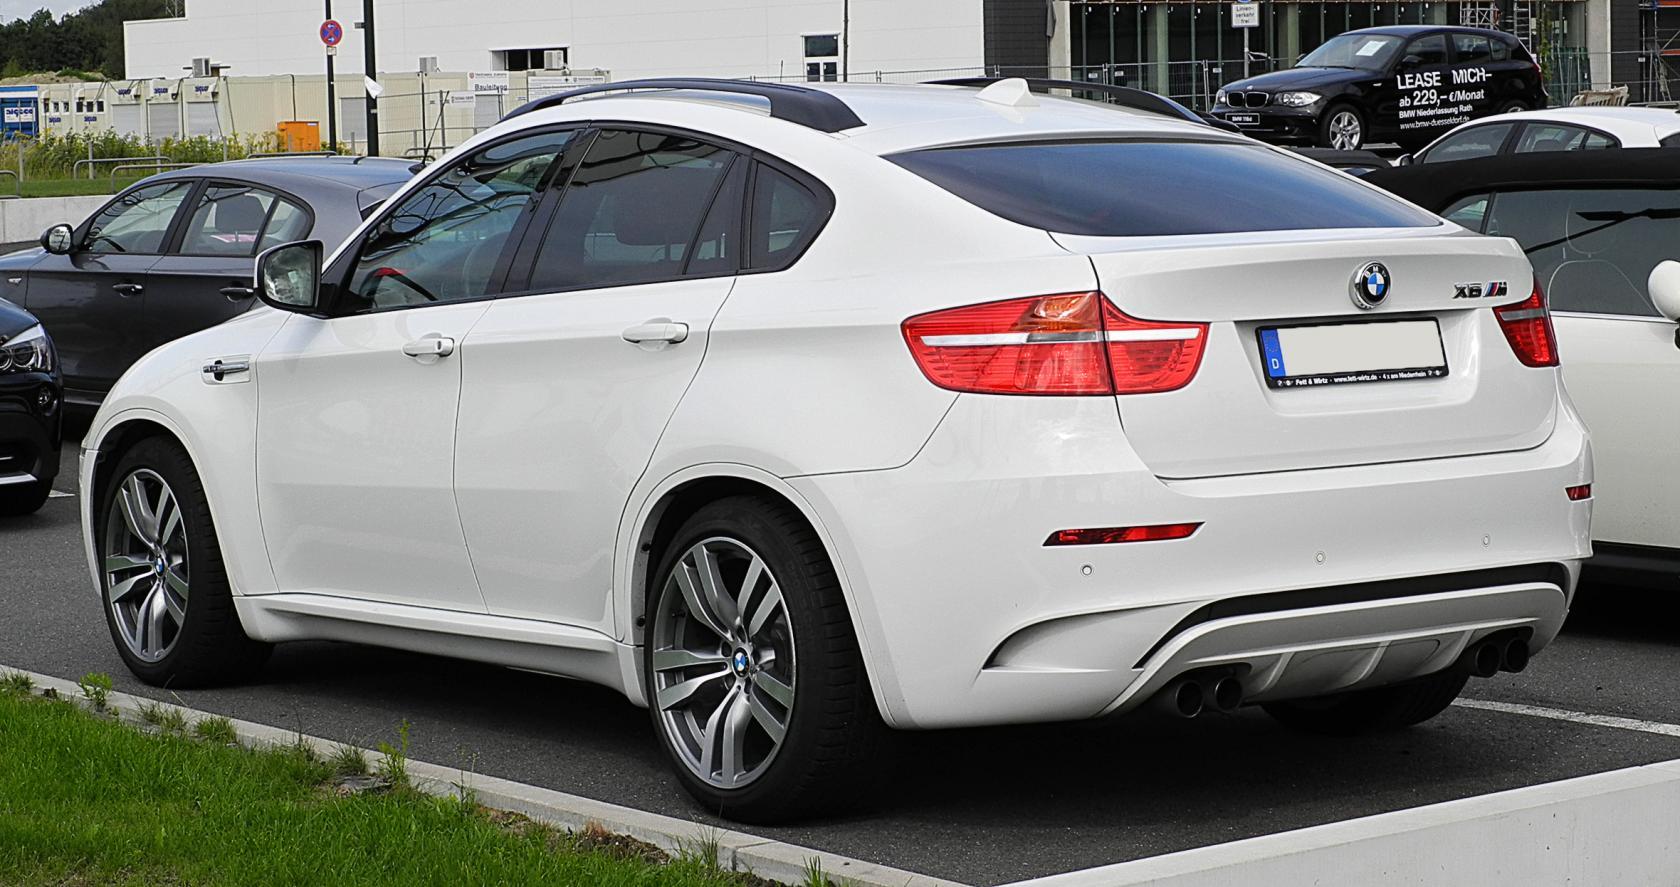 BMW-X6-M-E71-6